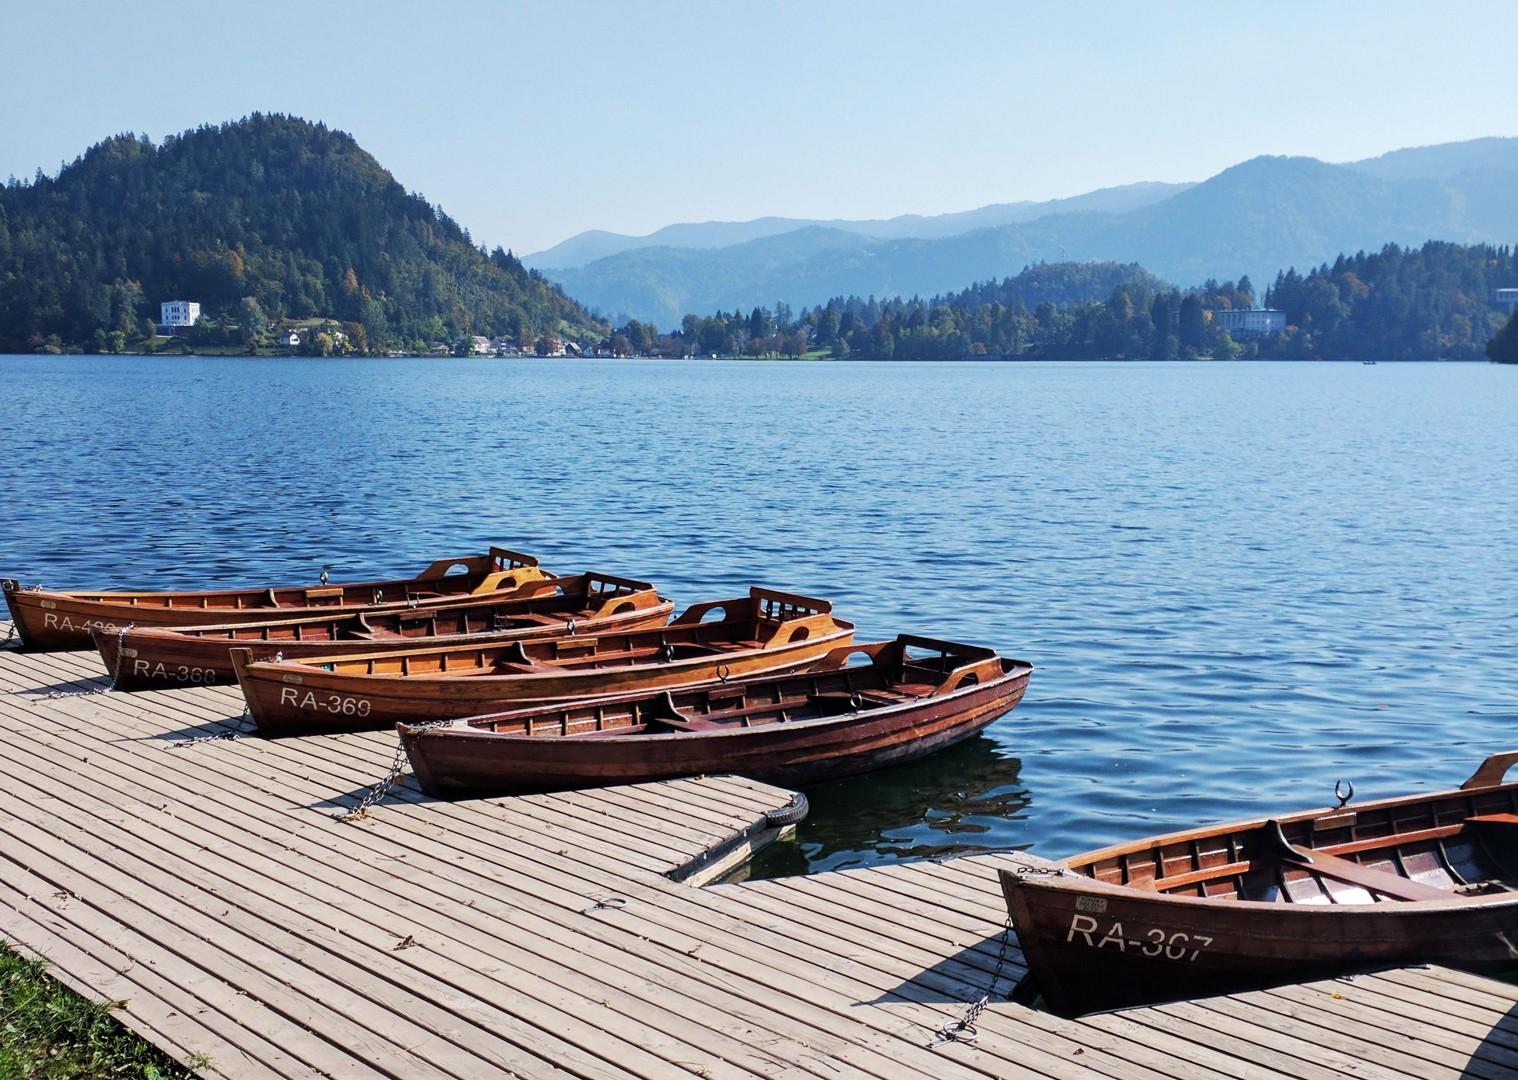 vintgar-lake-bled-slovenia-family-cycling-holiday.jpg - NEW! Slovenia - Magical Lake Bled - Family Cycling